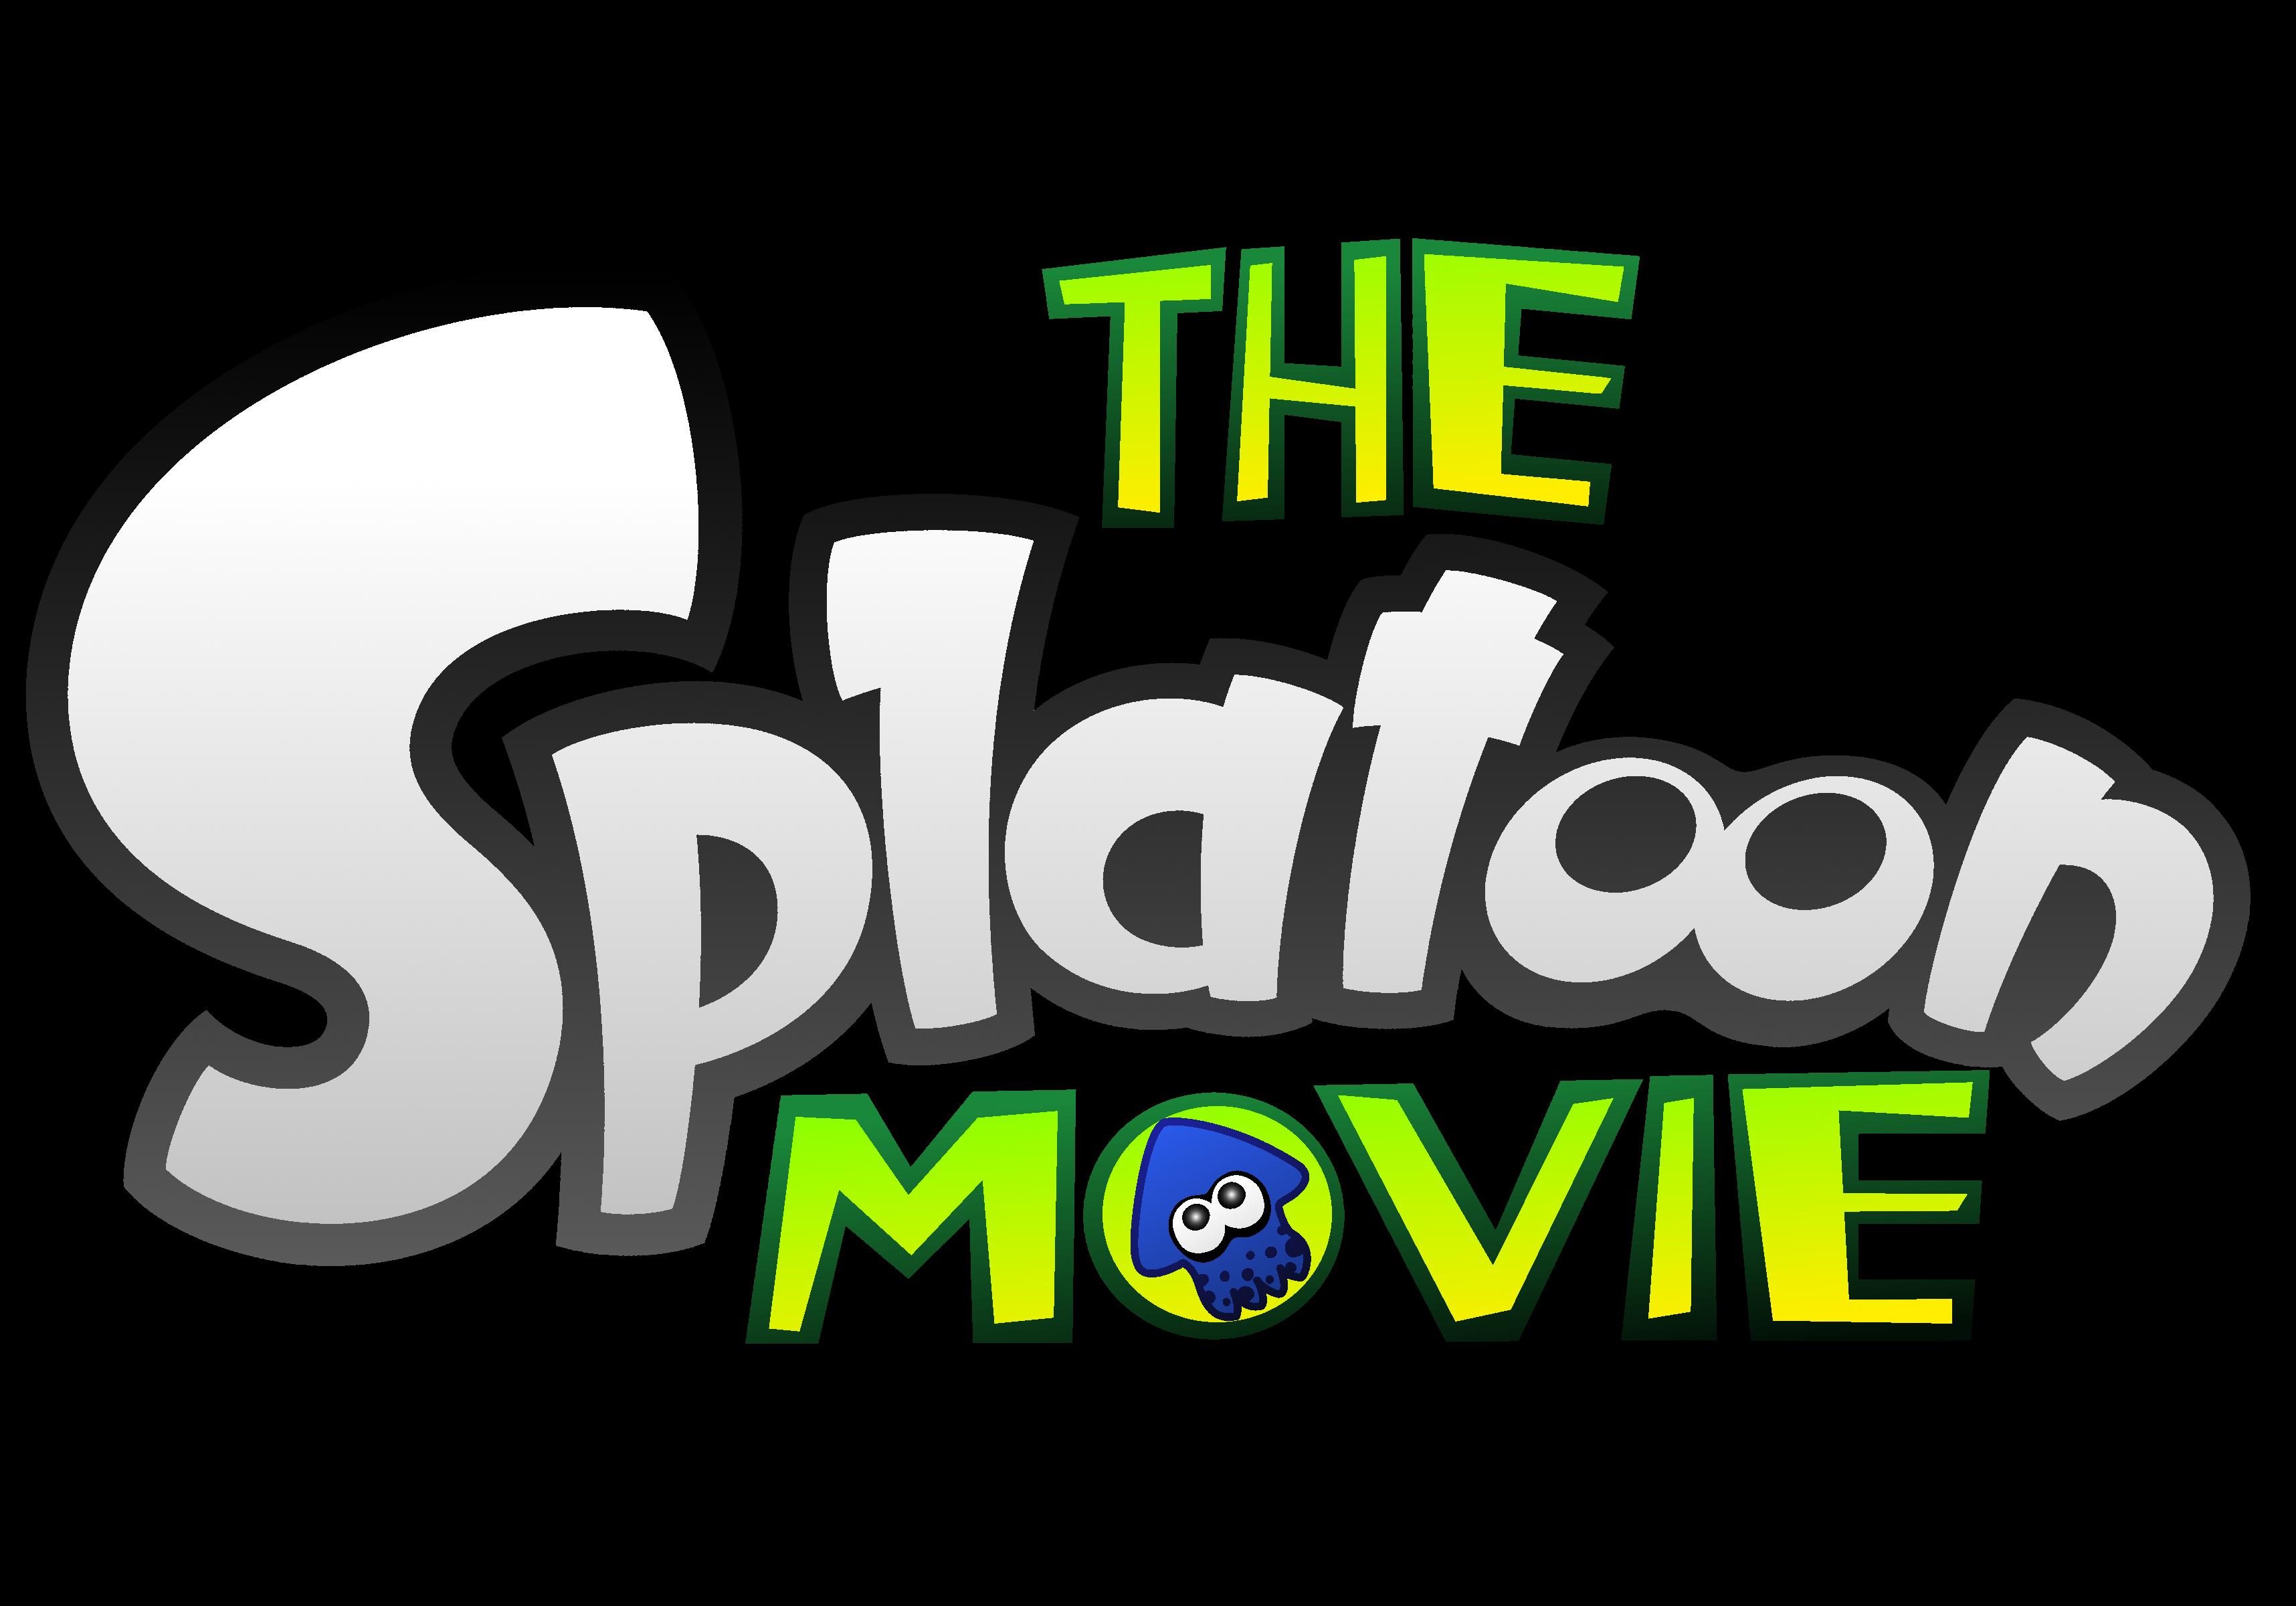 The Splatoon Movie